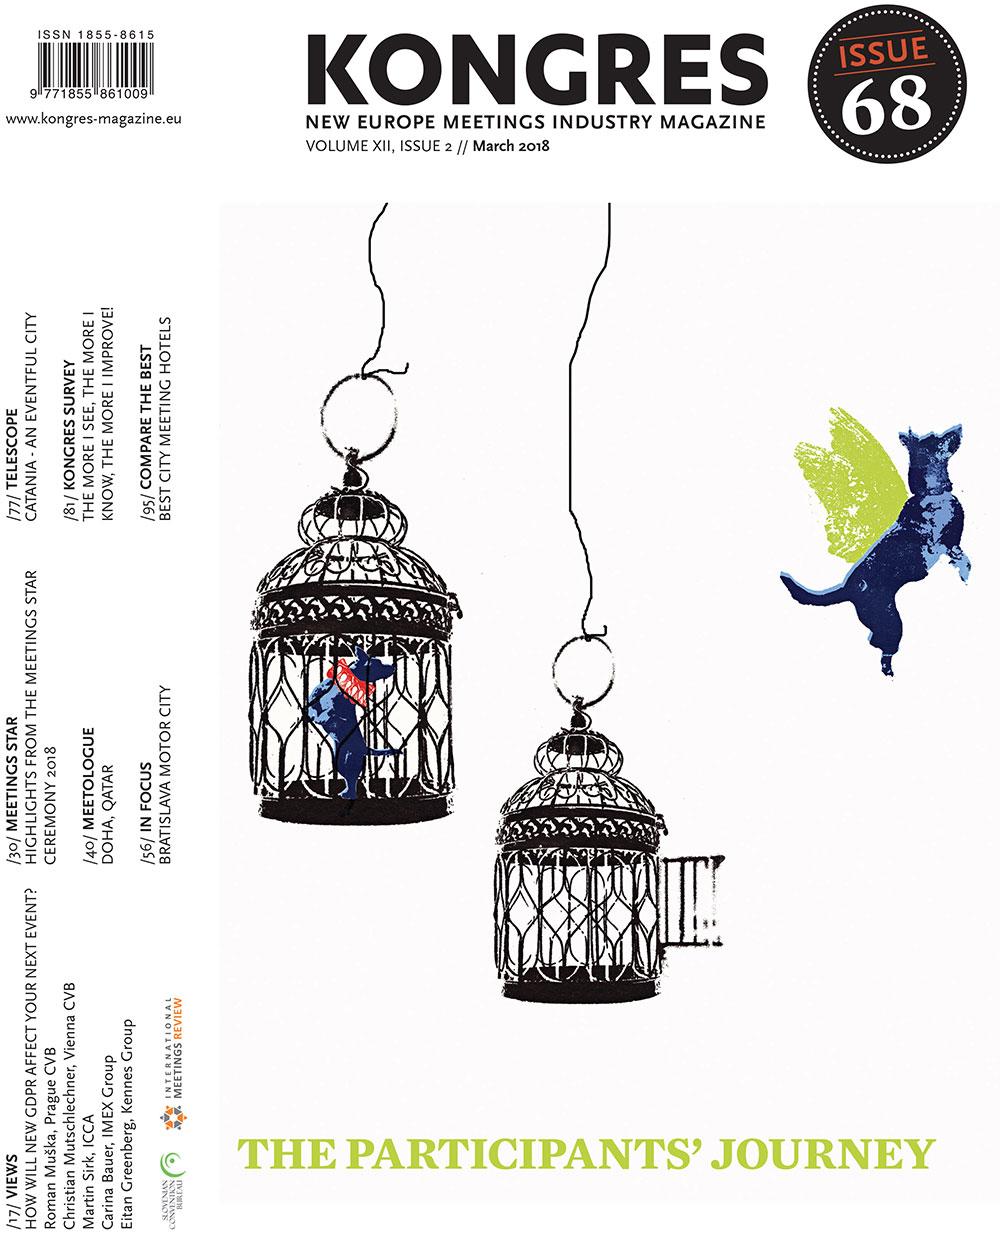 vizualno-oblikovanje-kongres-magazine-marec